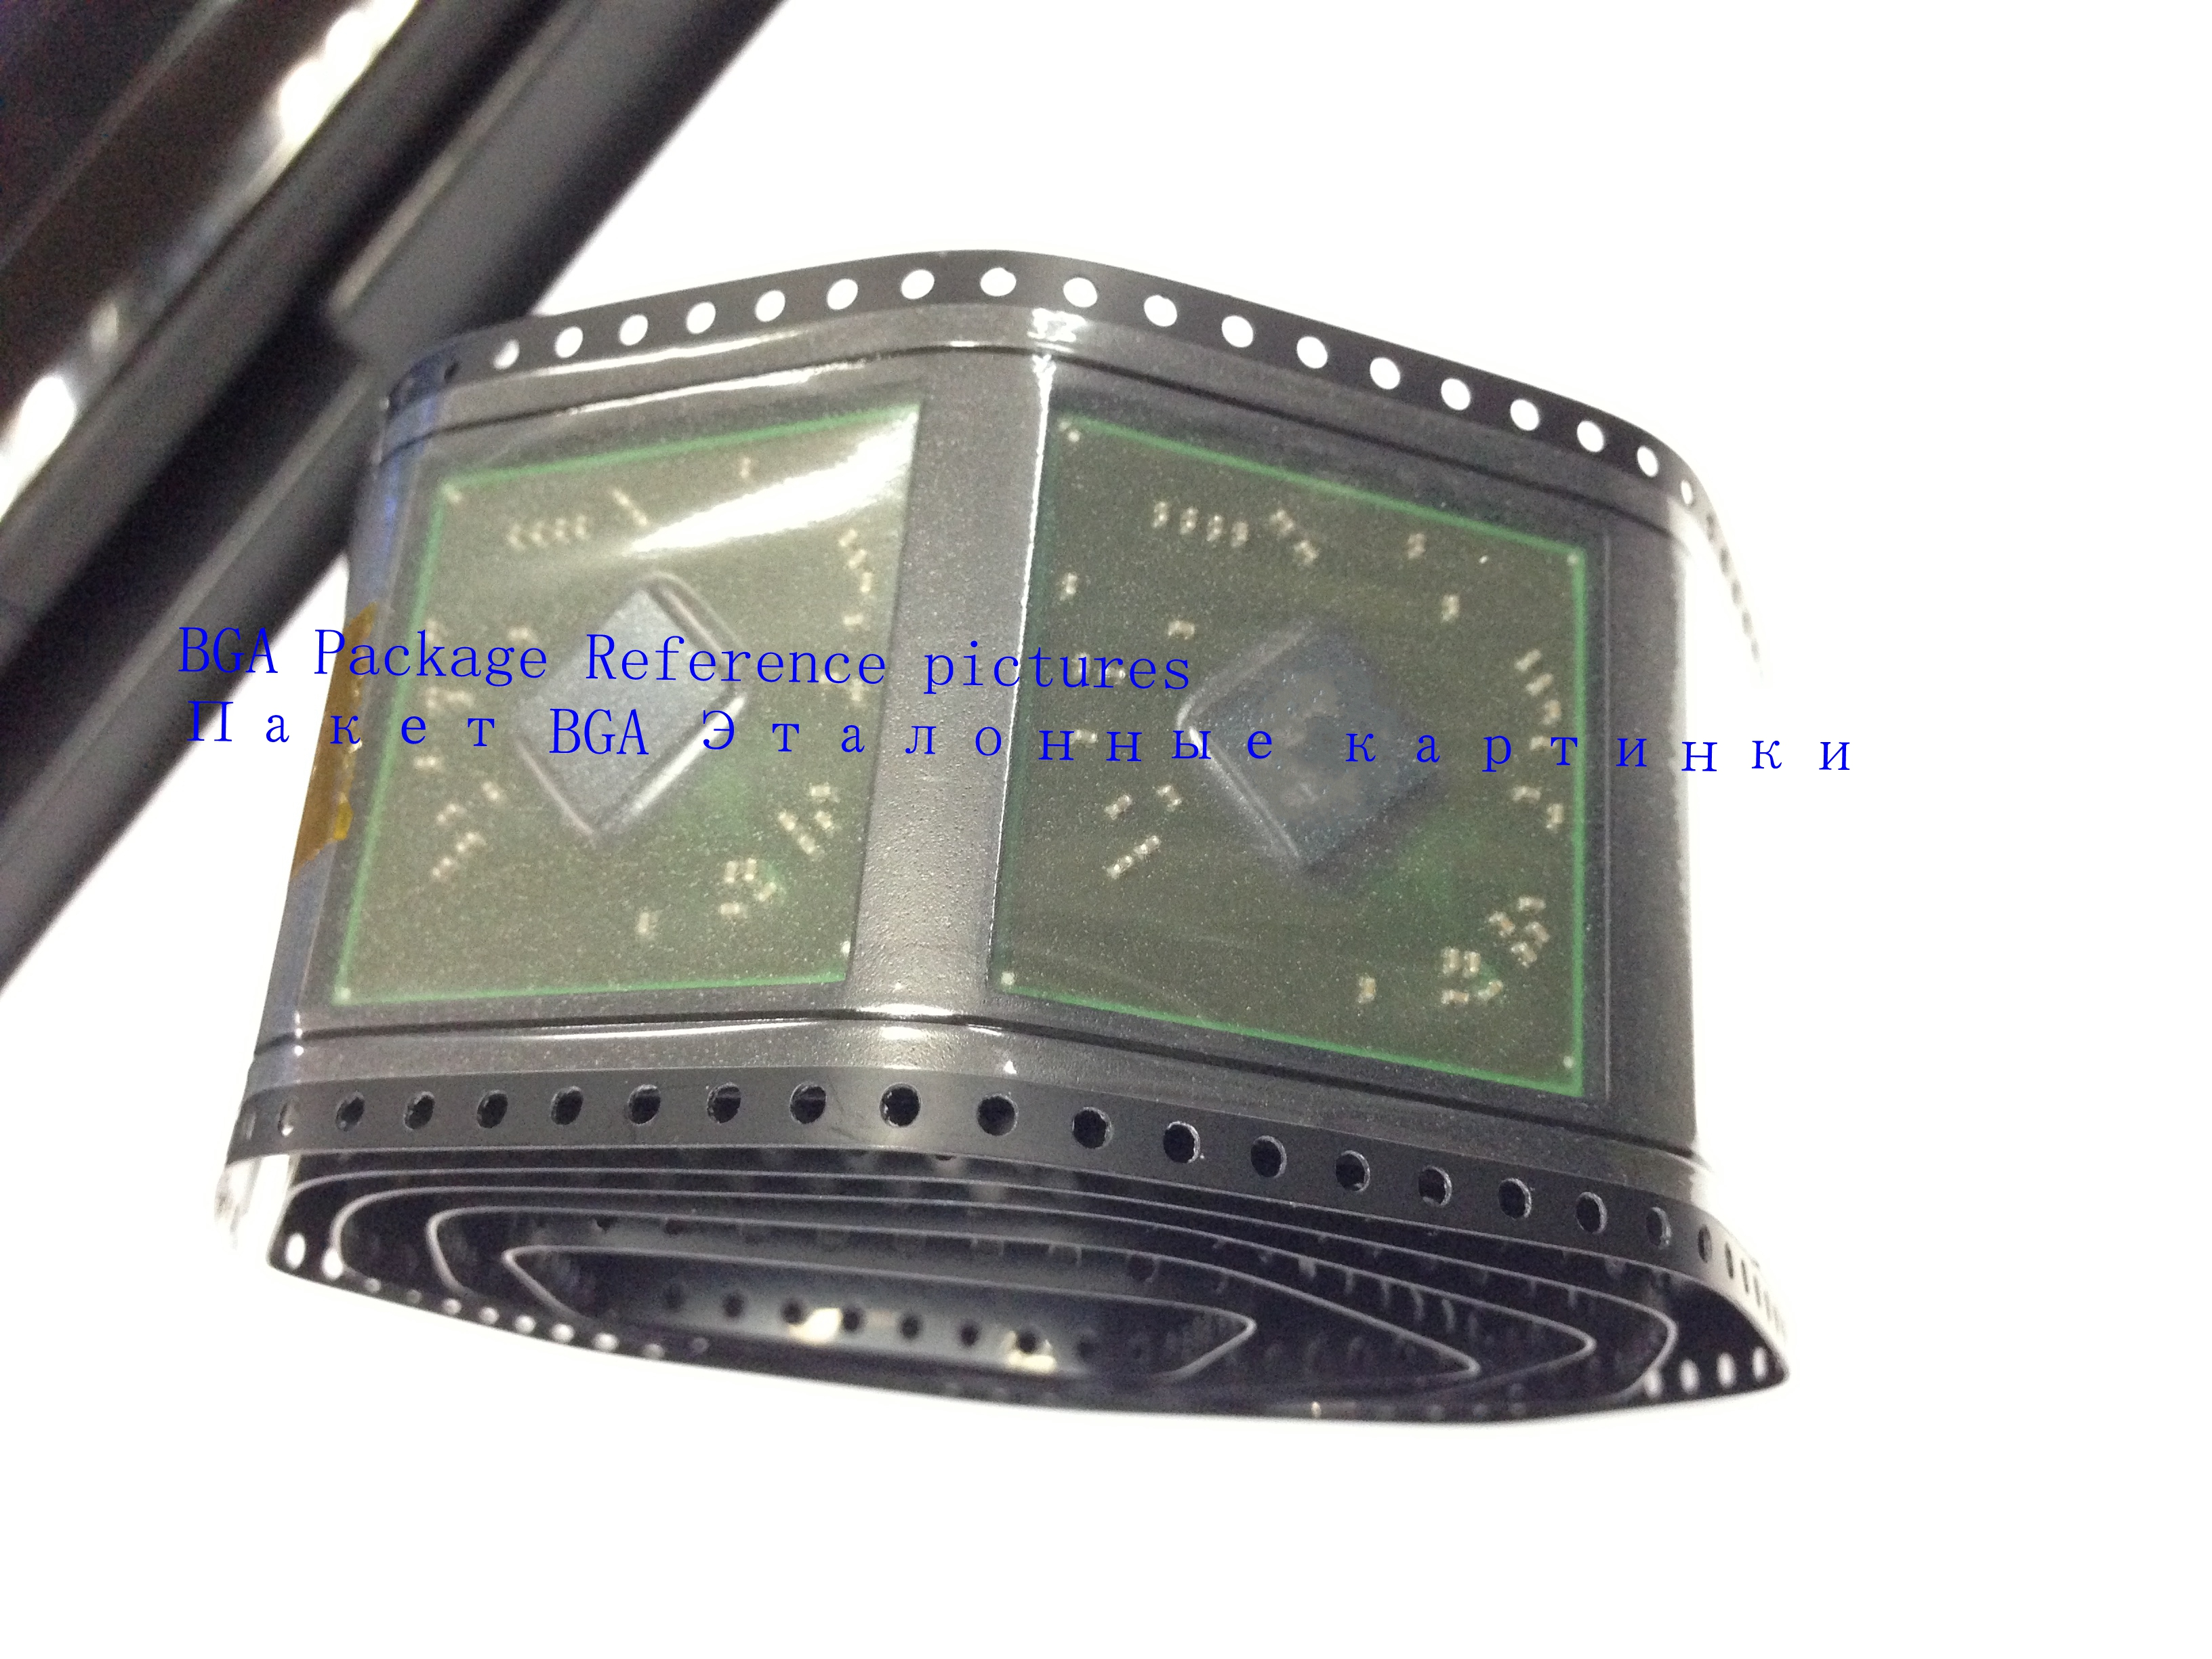 1pcs/lot 100% test very good product 218-0755042 218 0755042 bga chip reball with balls IC chips1pcs/lot 100% test very good product 218-0755042 218 0755042 bga chip reball with balls IC chips